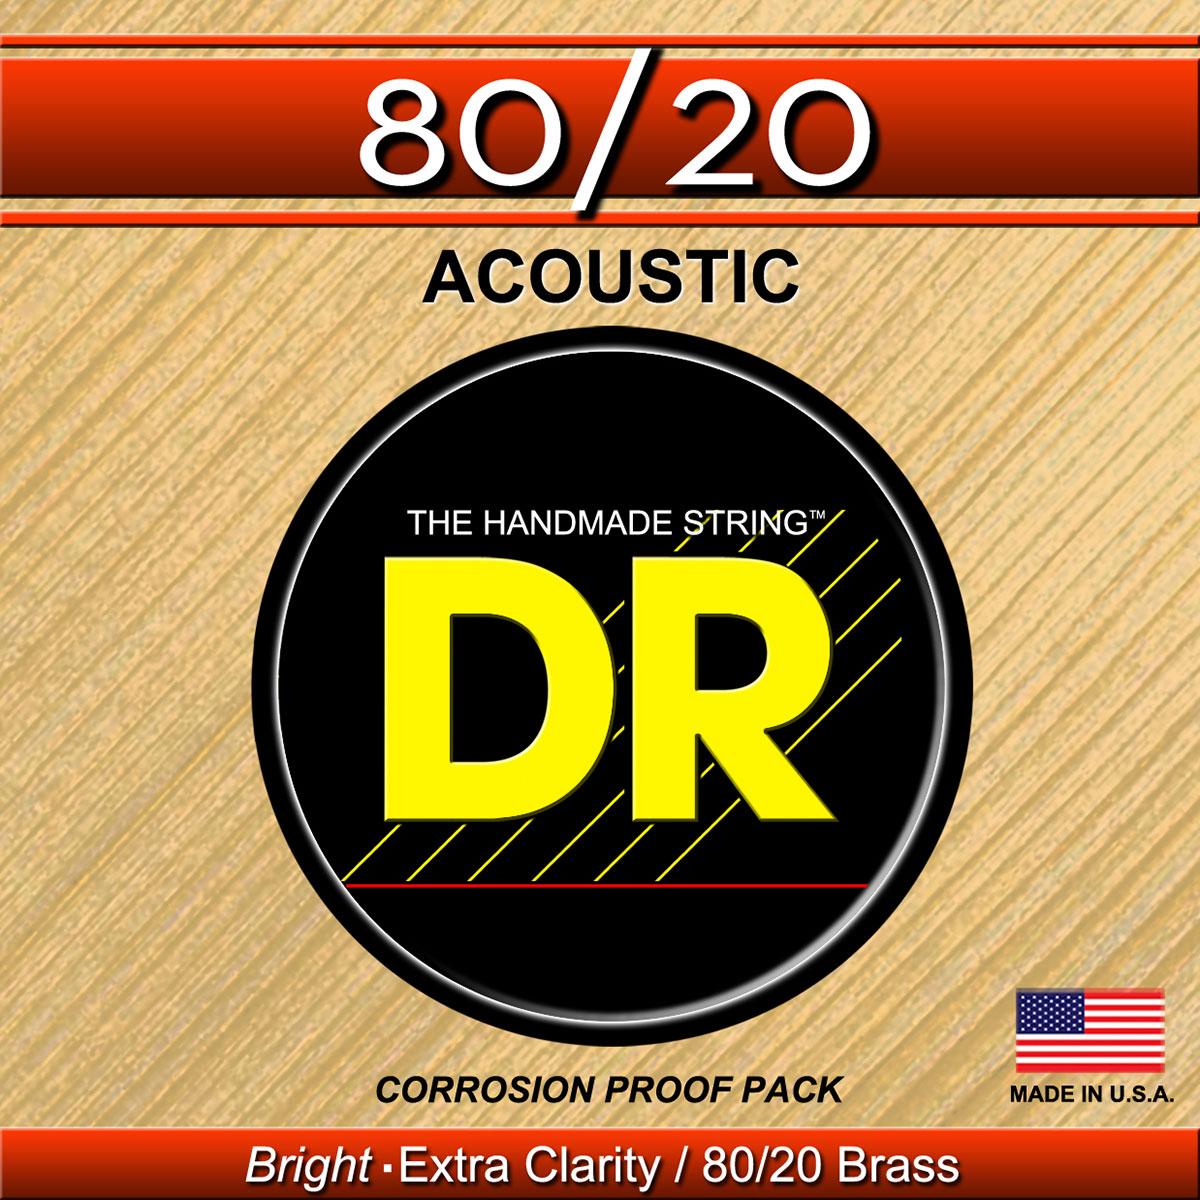 DR Strings Hi-Beam 80/20 Acoustic Medium - Light